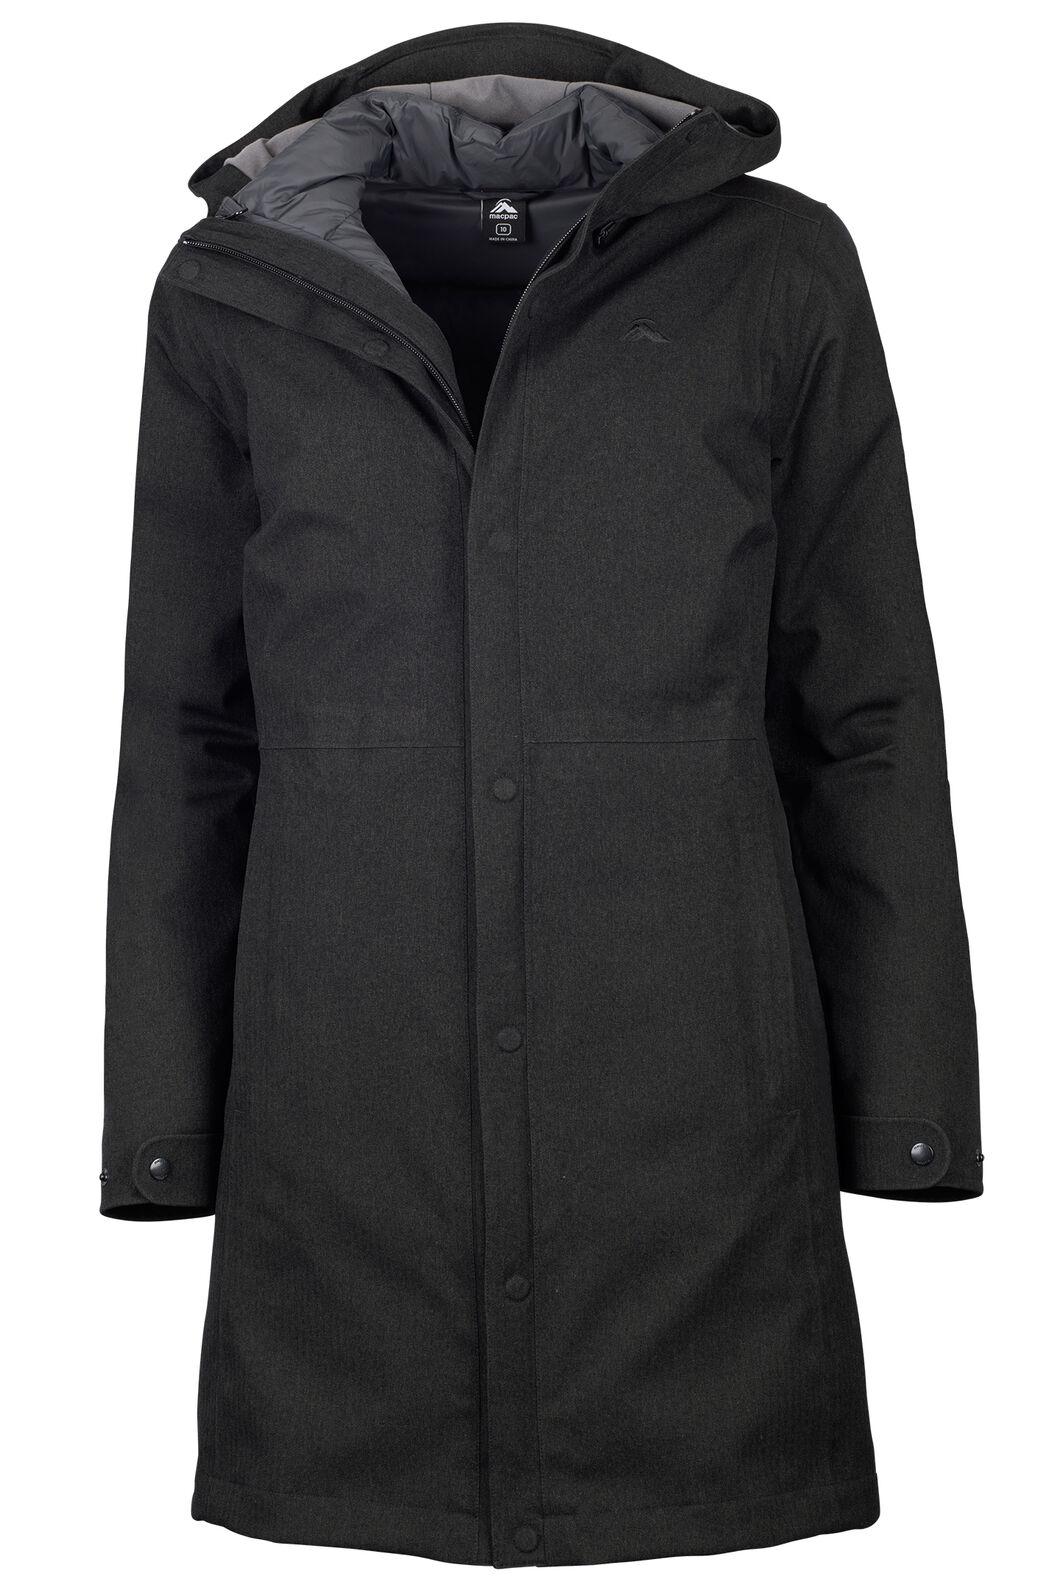 Macpac Element Three-In-One Coat - Women's, Black, hi-res